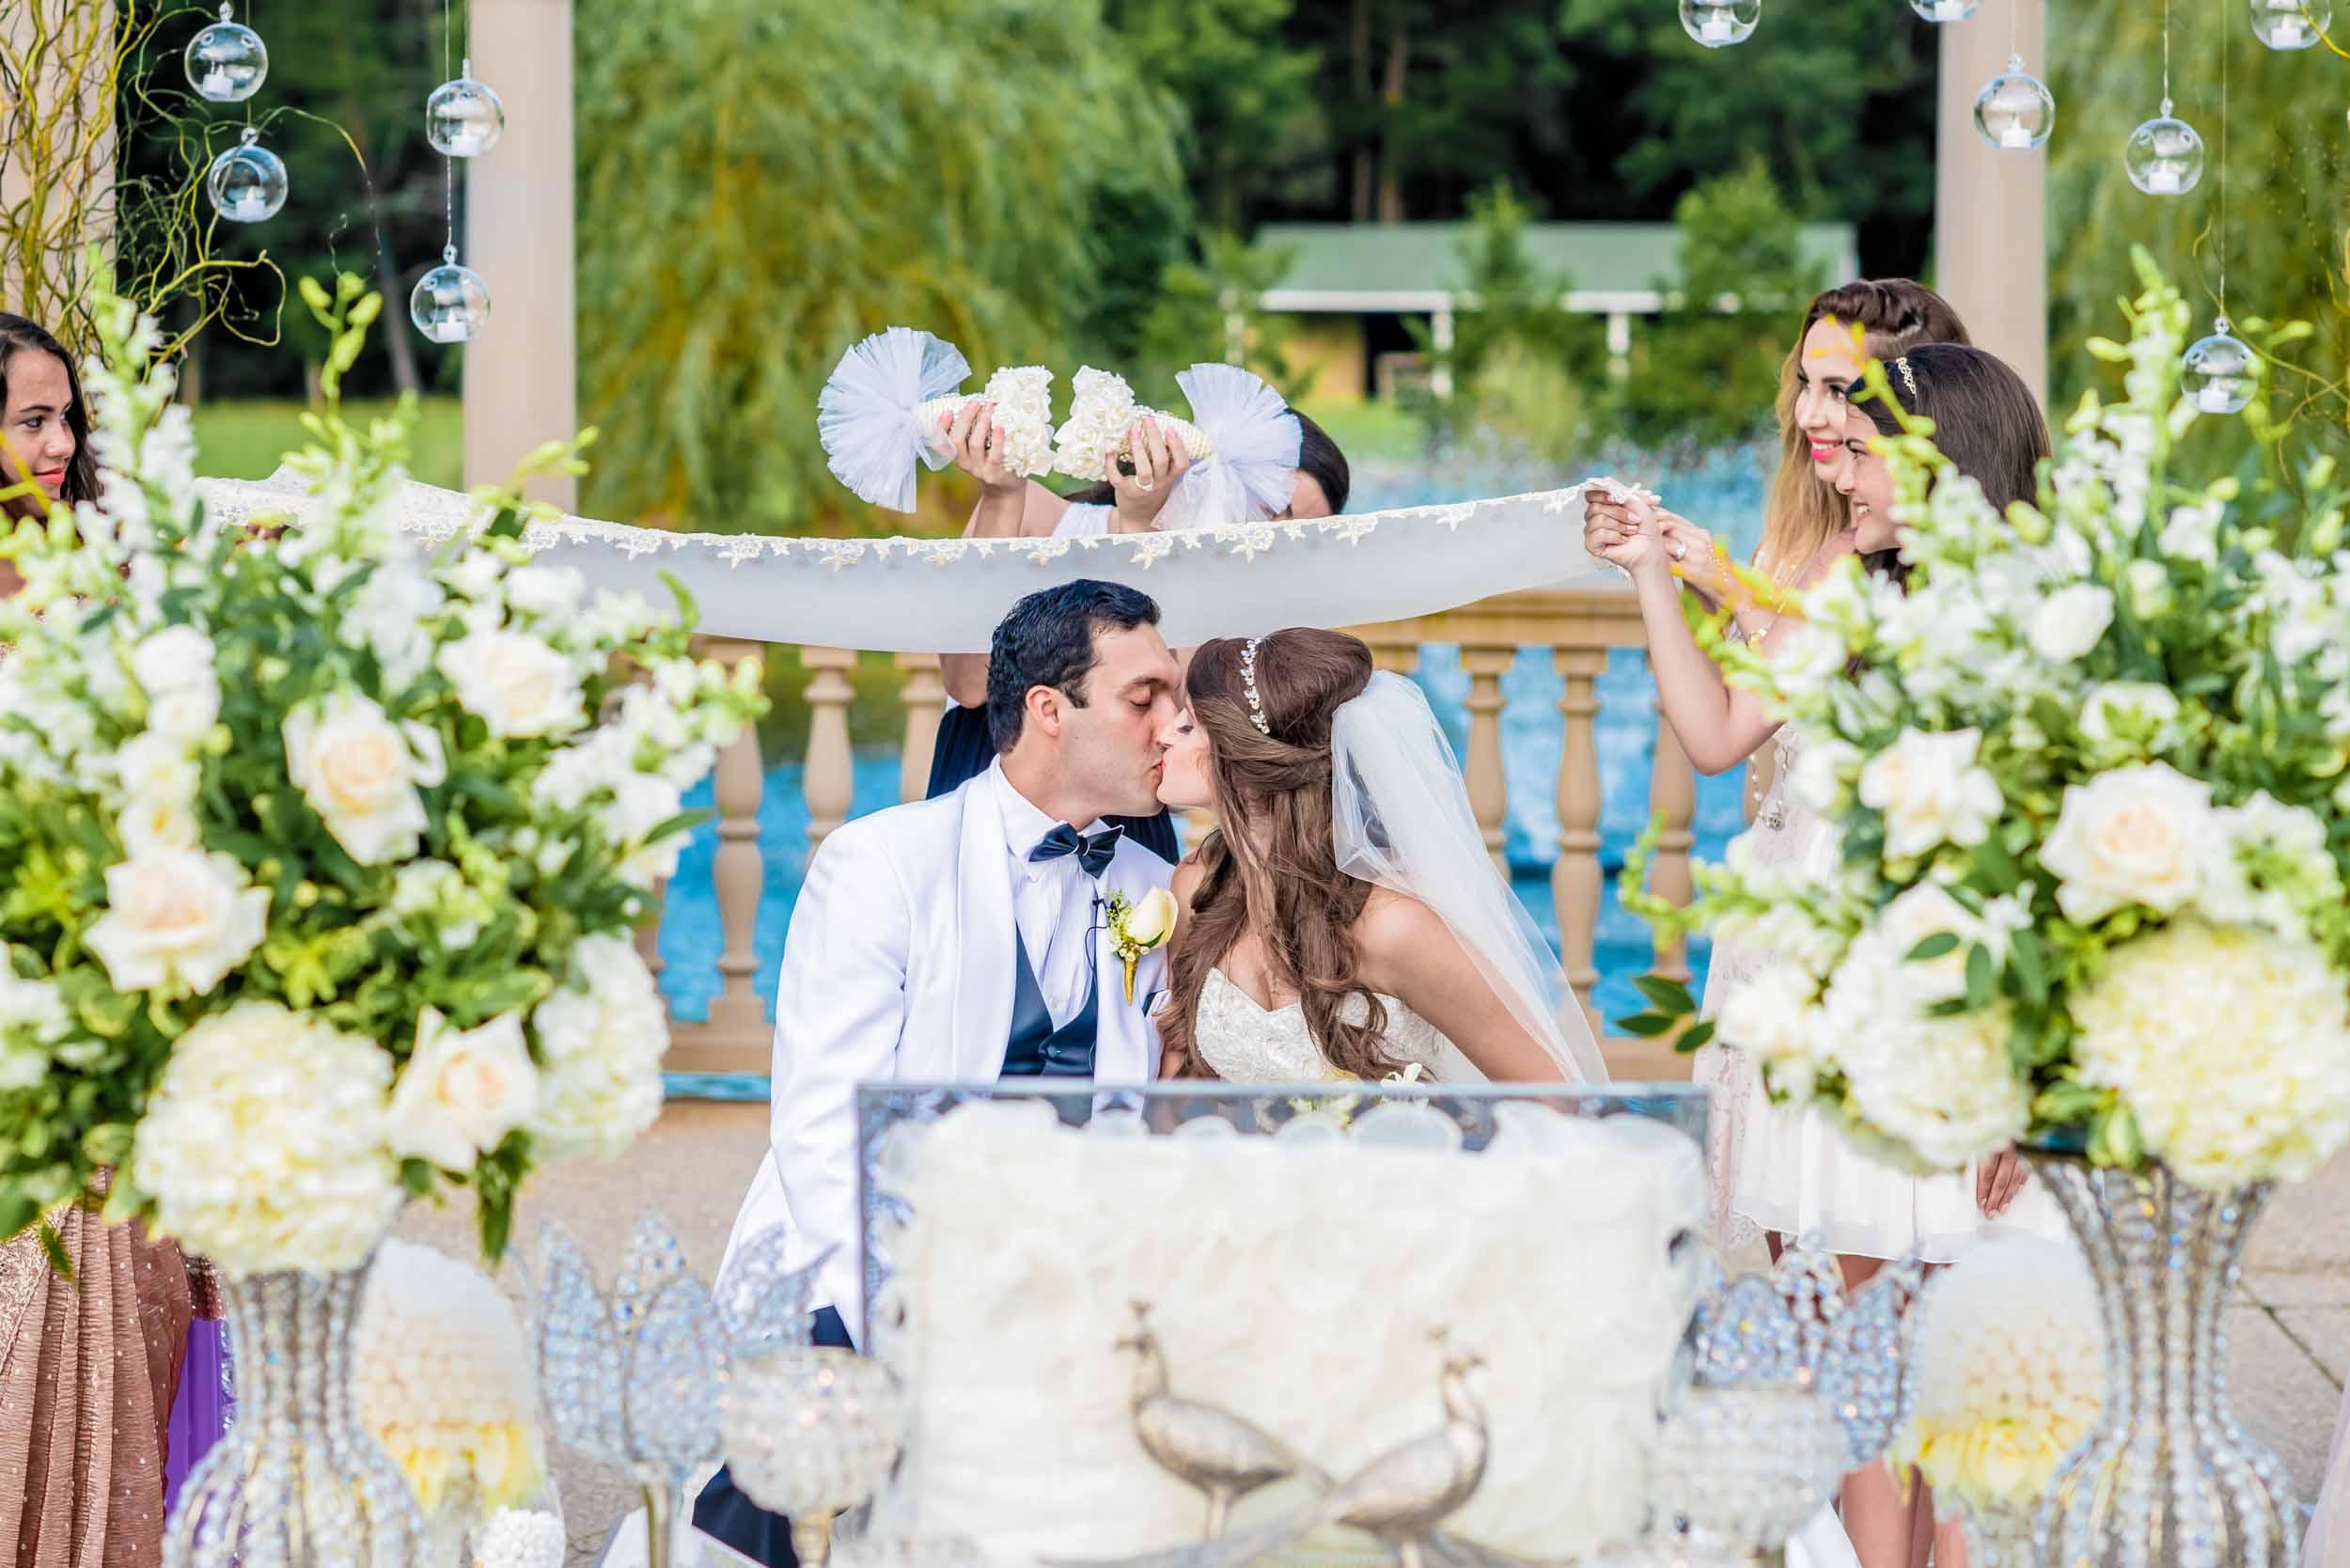 dc+metro+wedding+photographer+vadym+guliuk+photography+wedding+first+kiss-2023.jpg